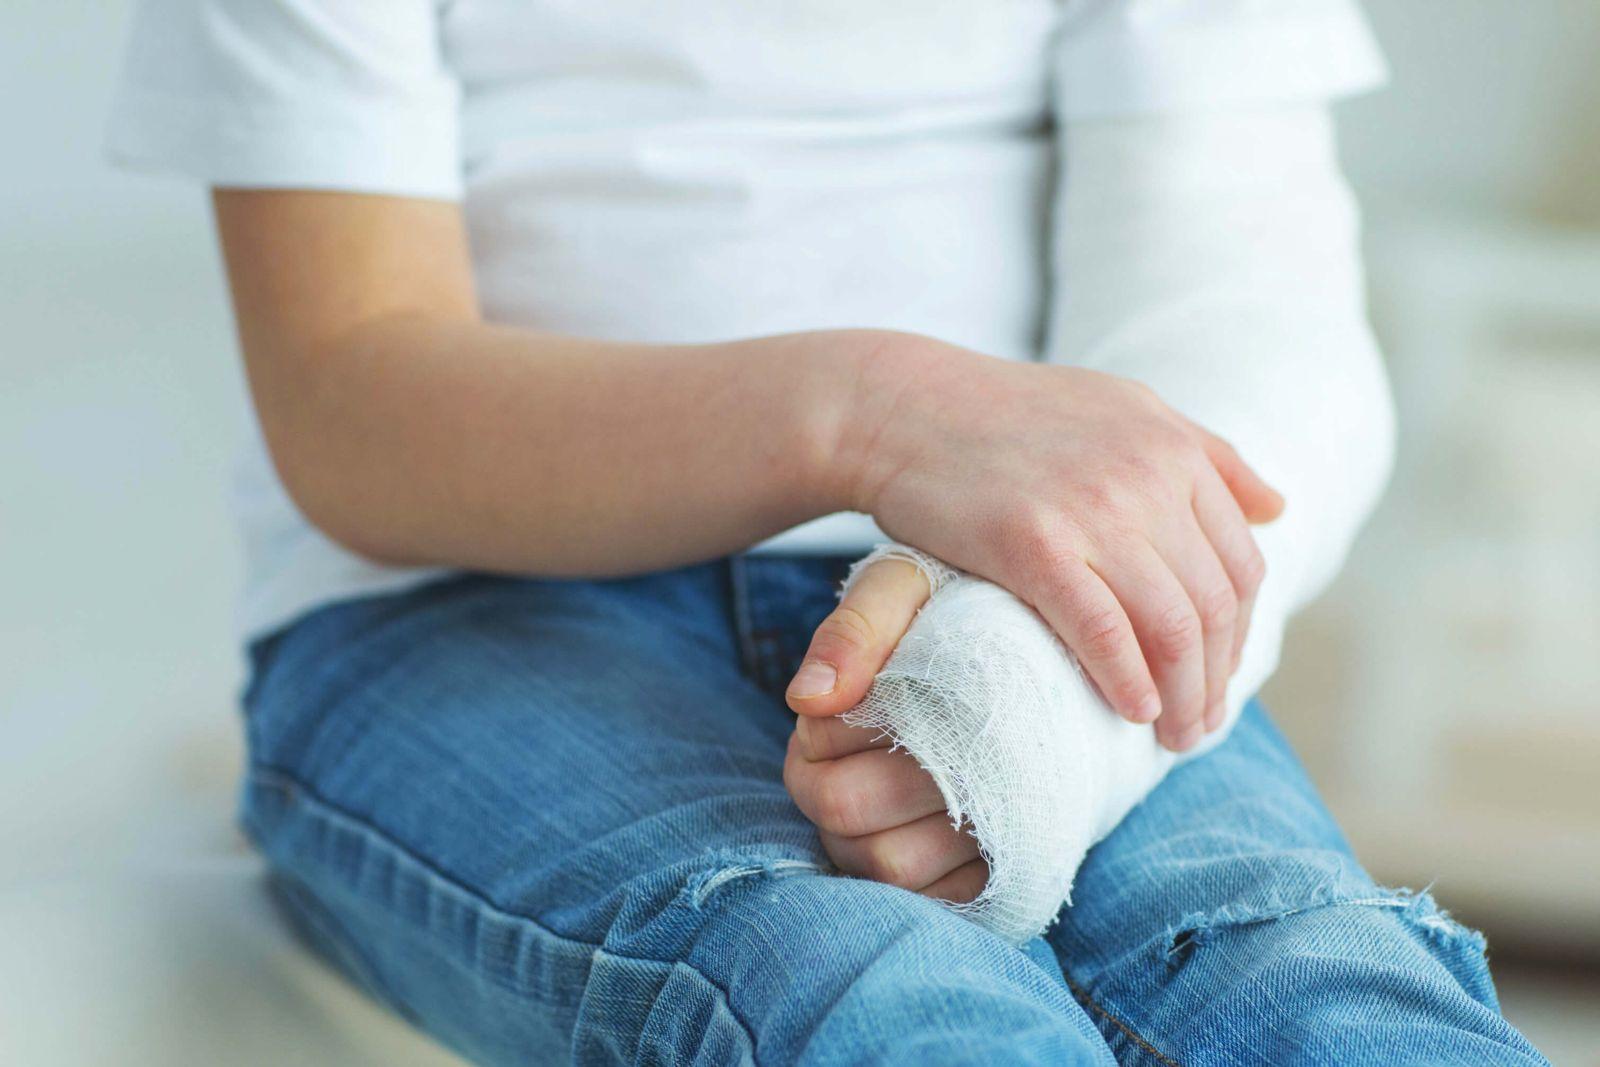 Kansas Personal Injury Claims Involving Minors